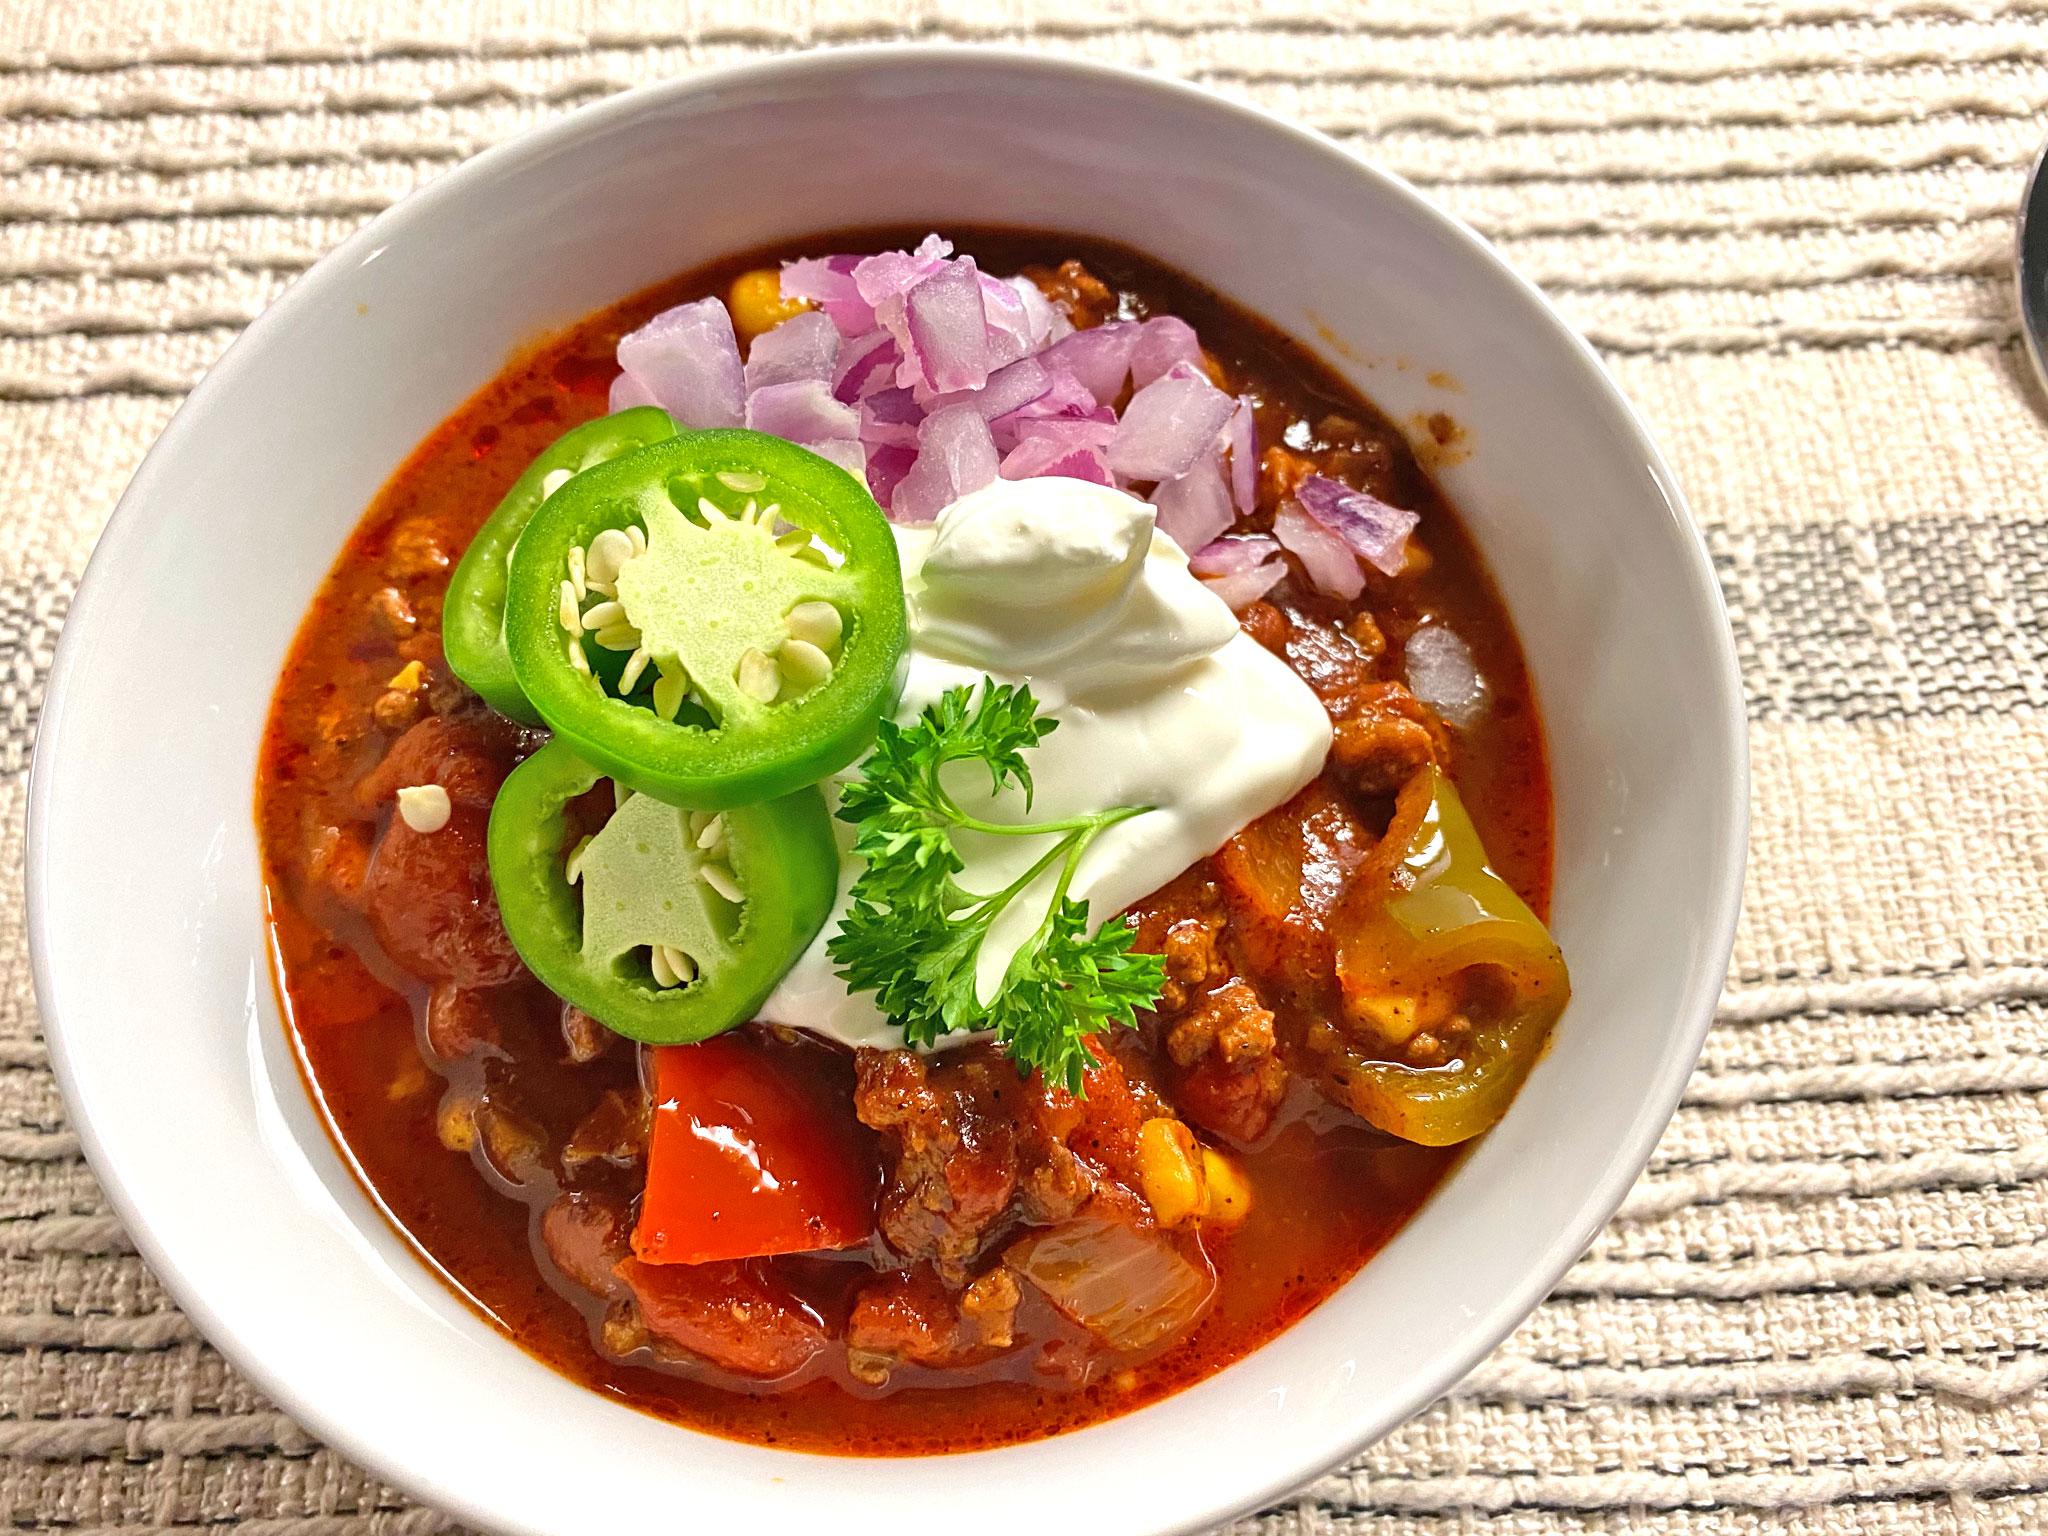 The Author's Homemade Chili